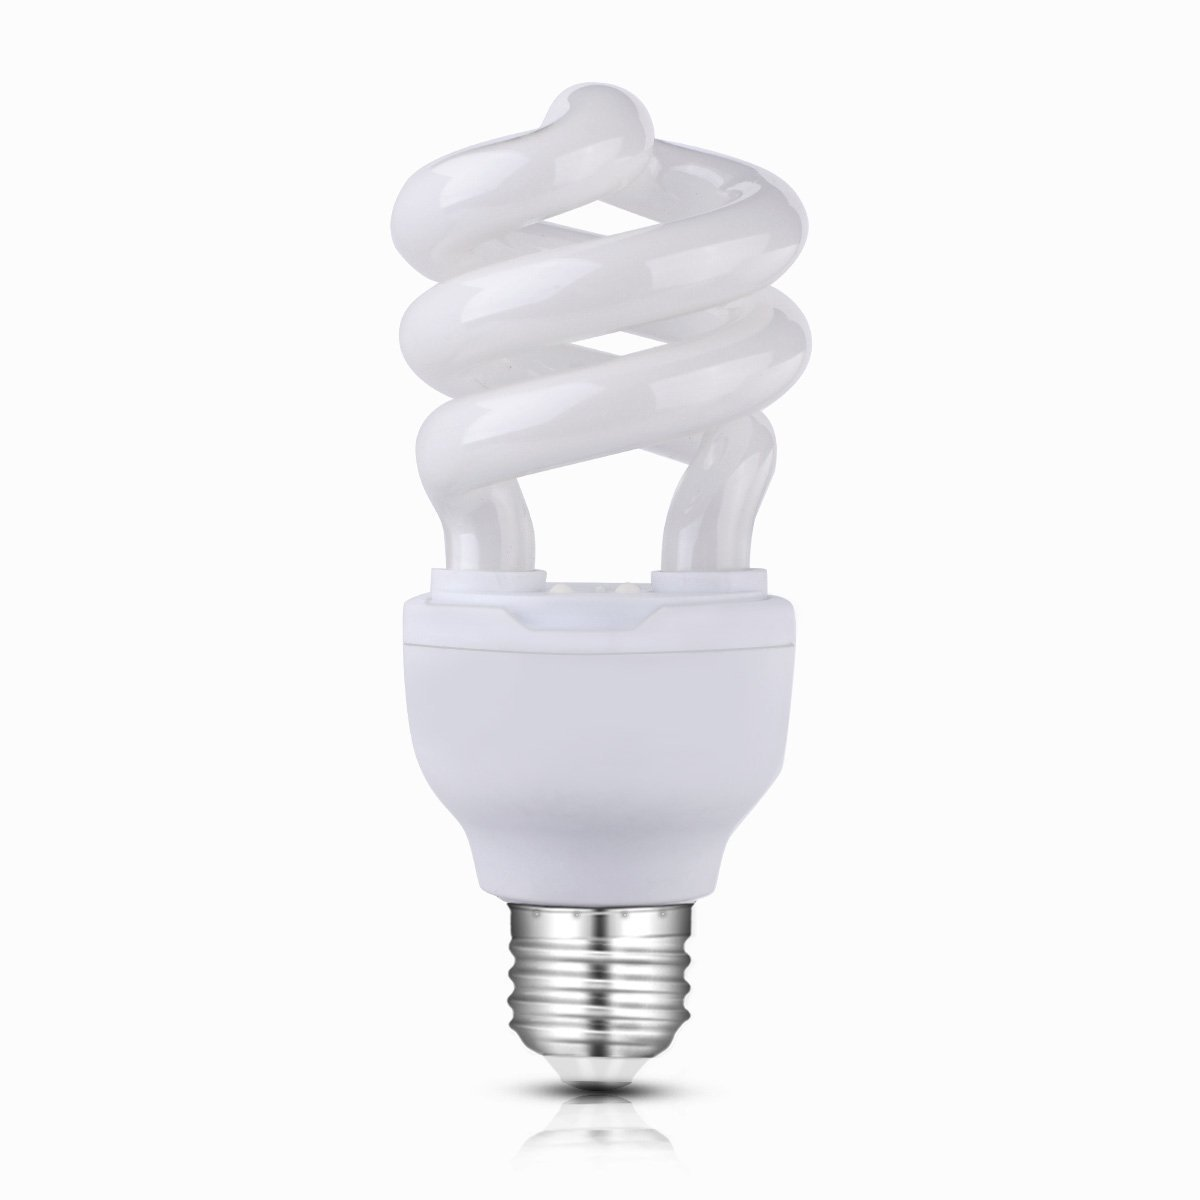 CTKcom UVB 10.0 UVB Reptile Light Bulb 13W Basking Calcium Lamp Compact Fluorescent Lamp,110V UV Bulb Light Calcium Lamp For Turtle Aquarium Aquatic Reptile Lizard Pets UVB Light,13 Watts